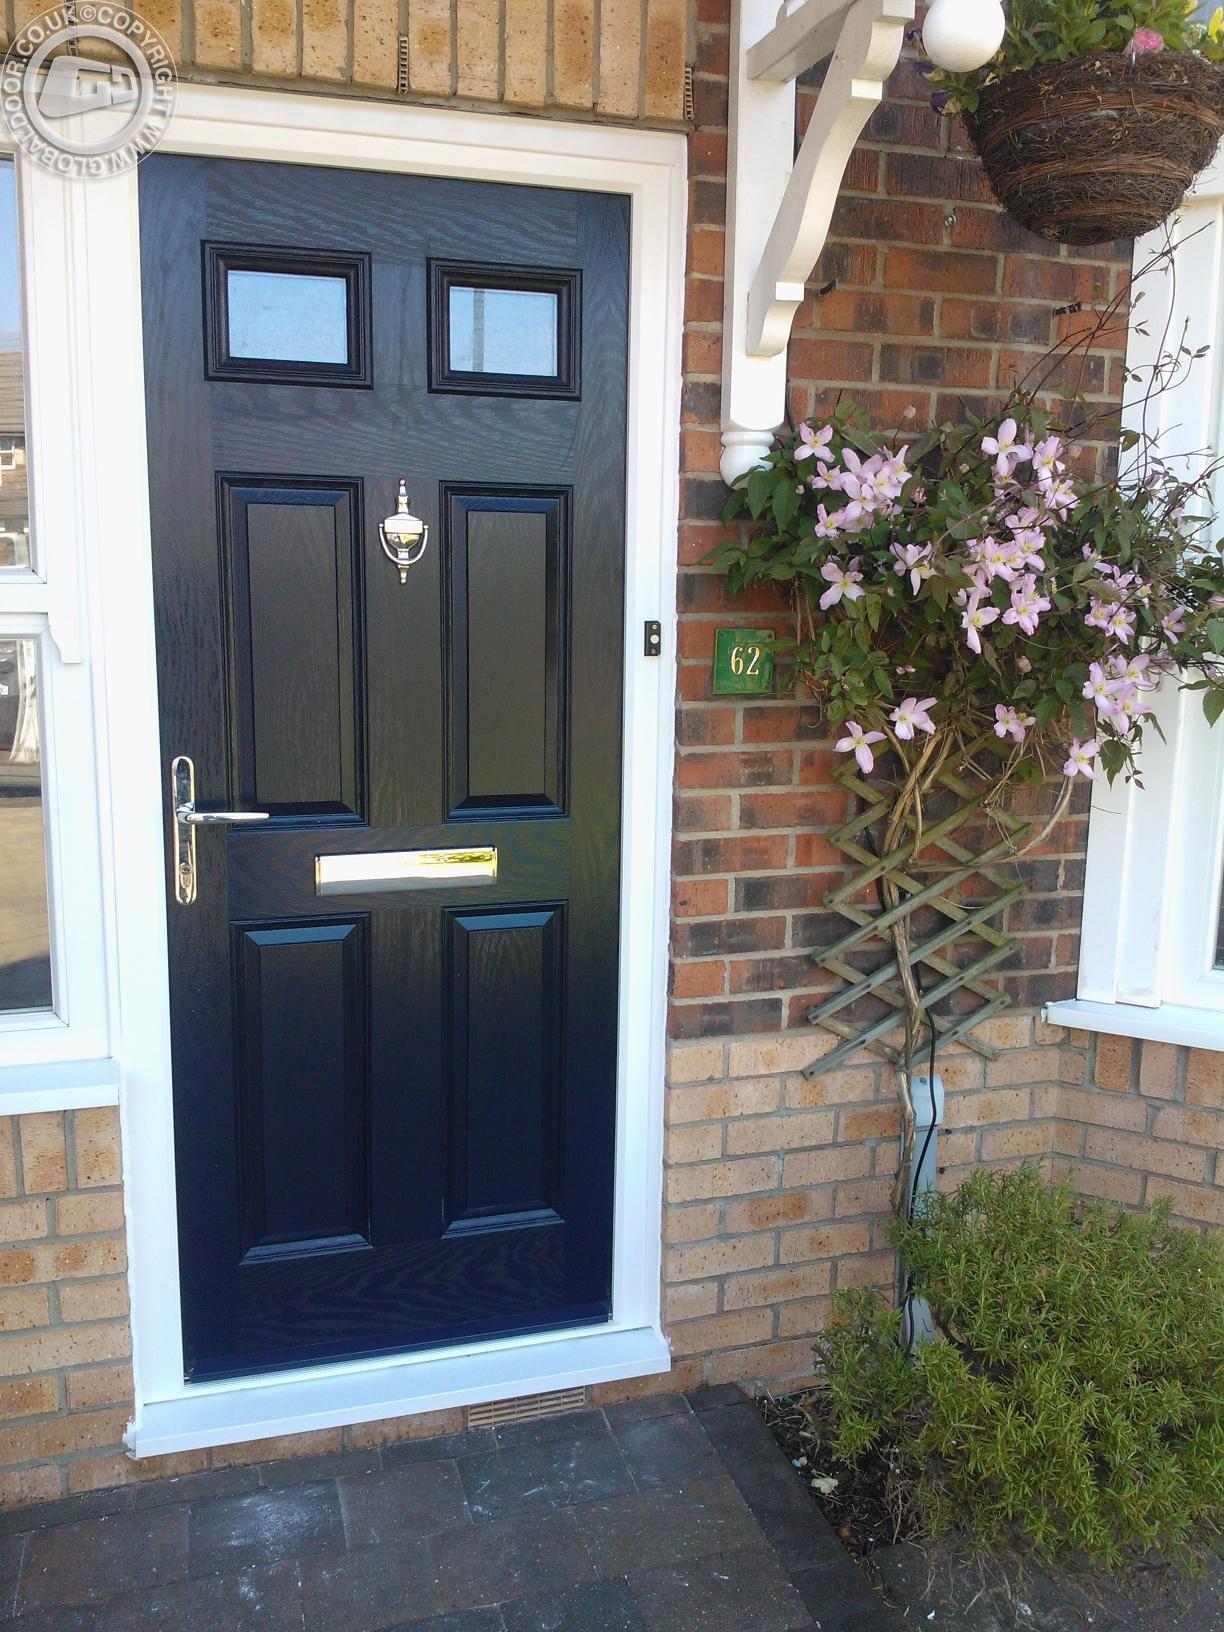 black-4-panel-2-square-global-composite-door- & black-4-panel-2-square-global-composite-door-flag-window | Doors ...